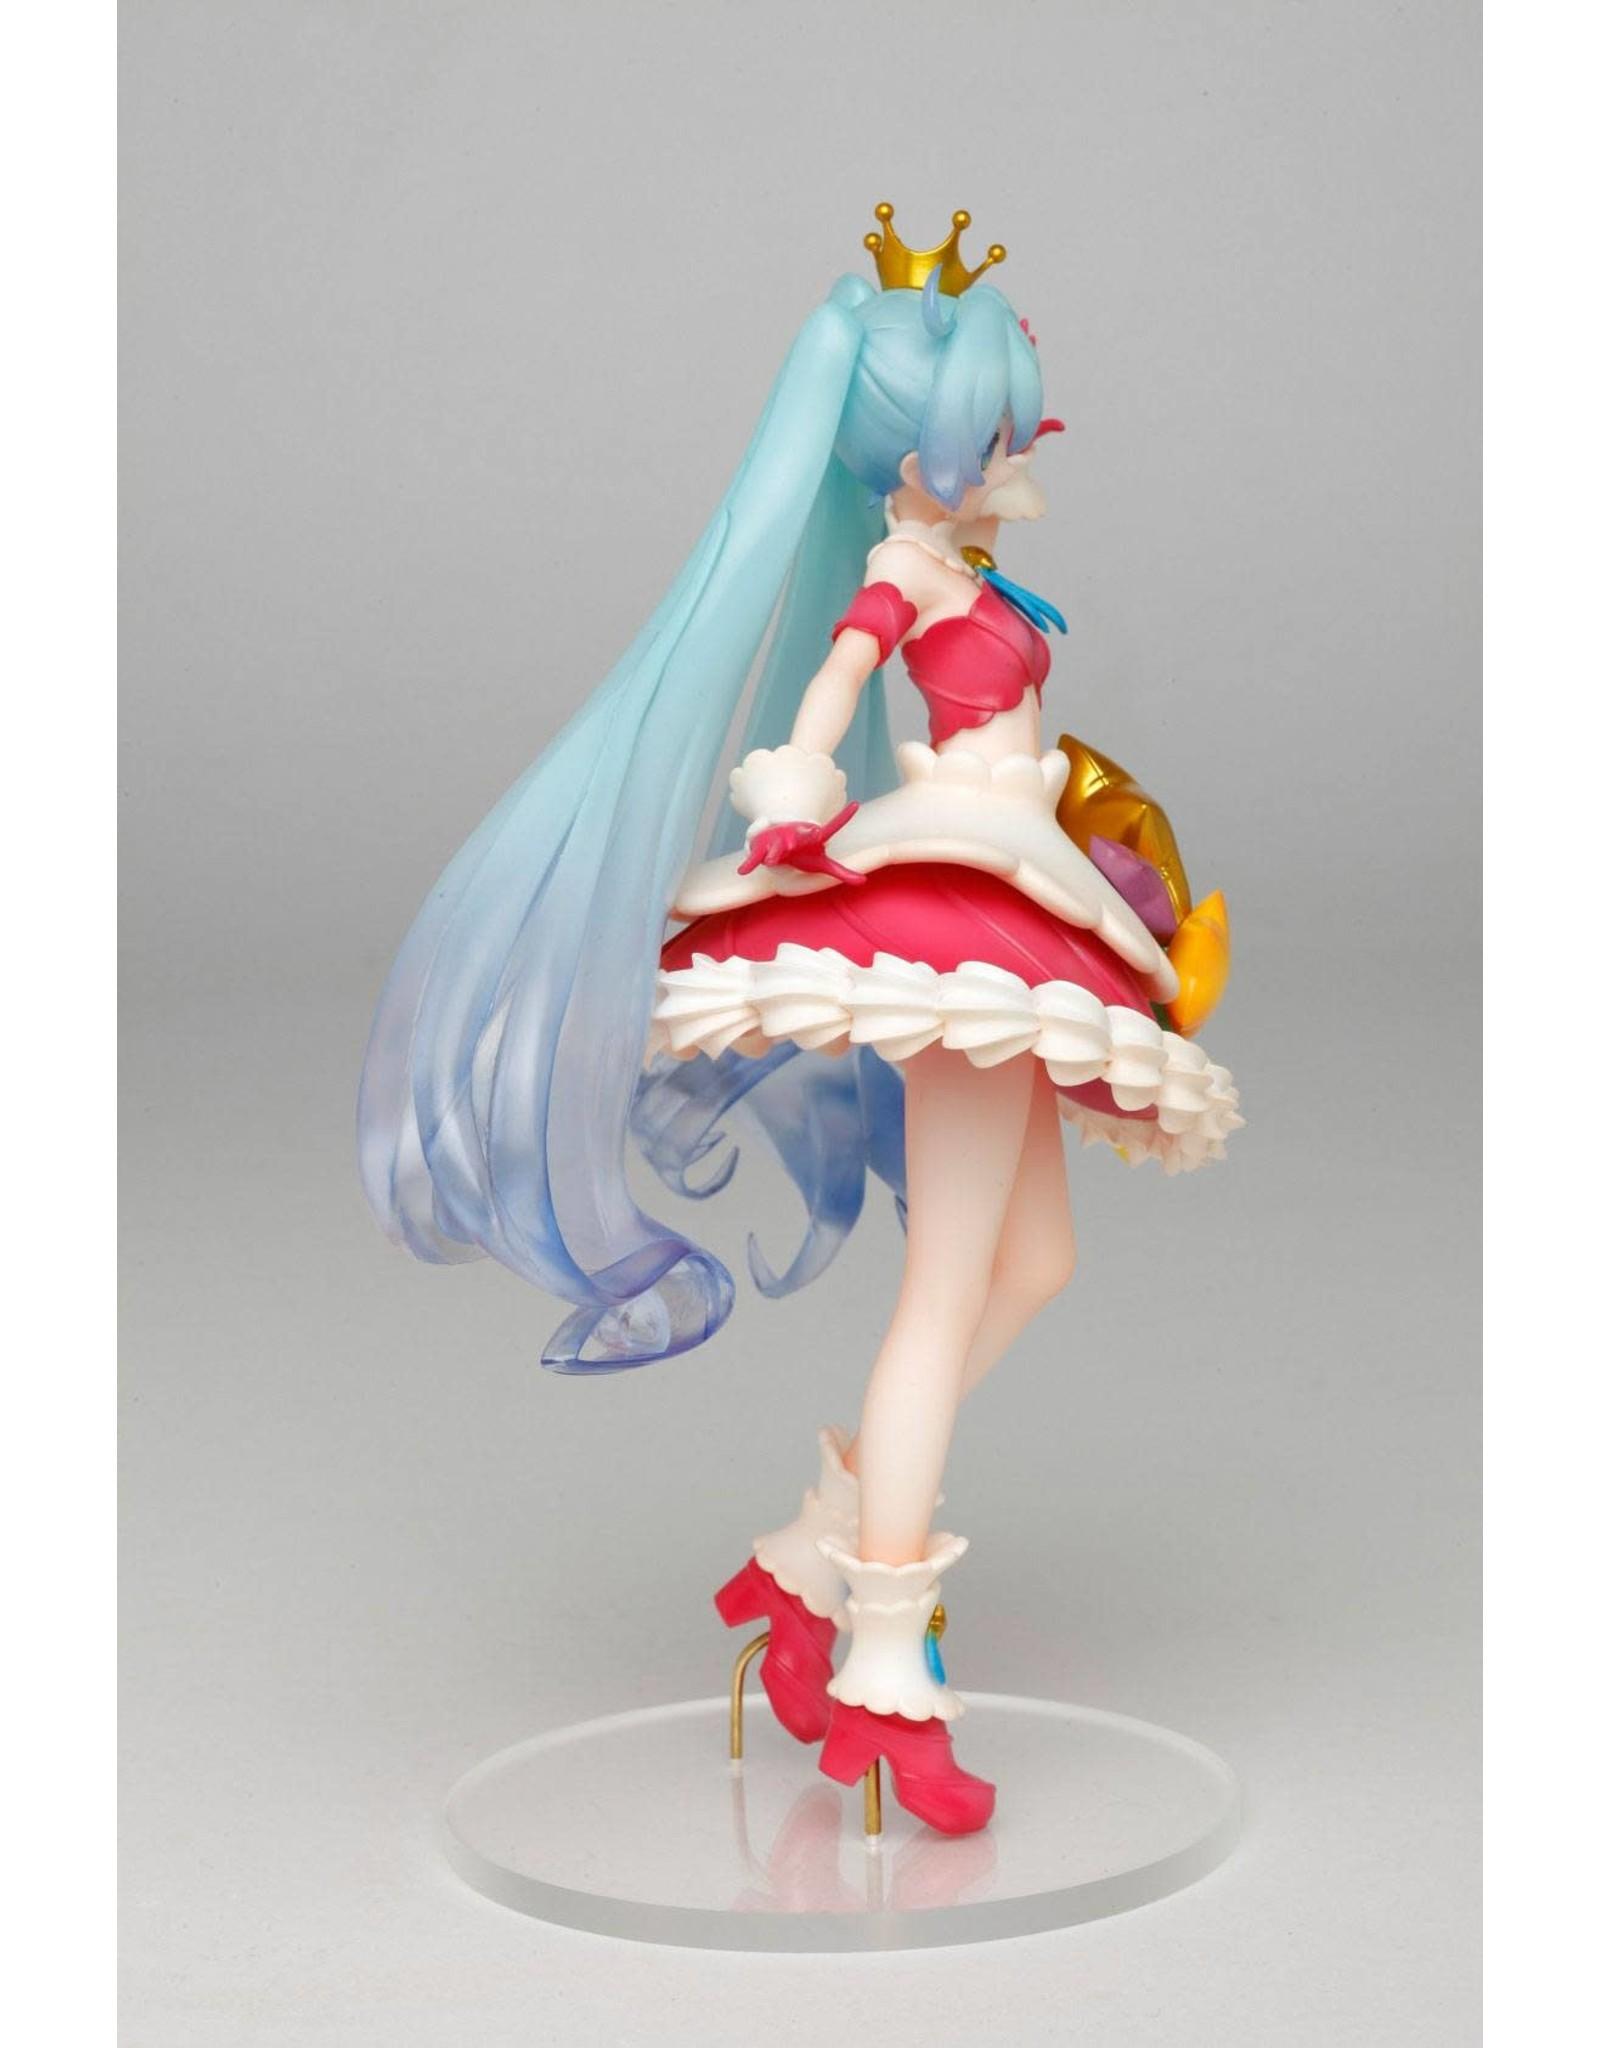 Hatsune Miku - Birthday 2020 Pop Idol Version - PVC Figure - 18 cm